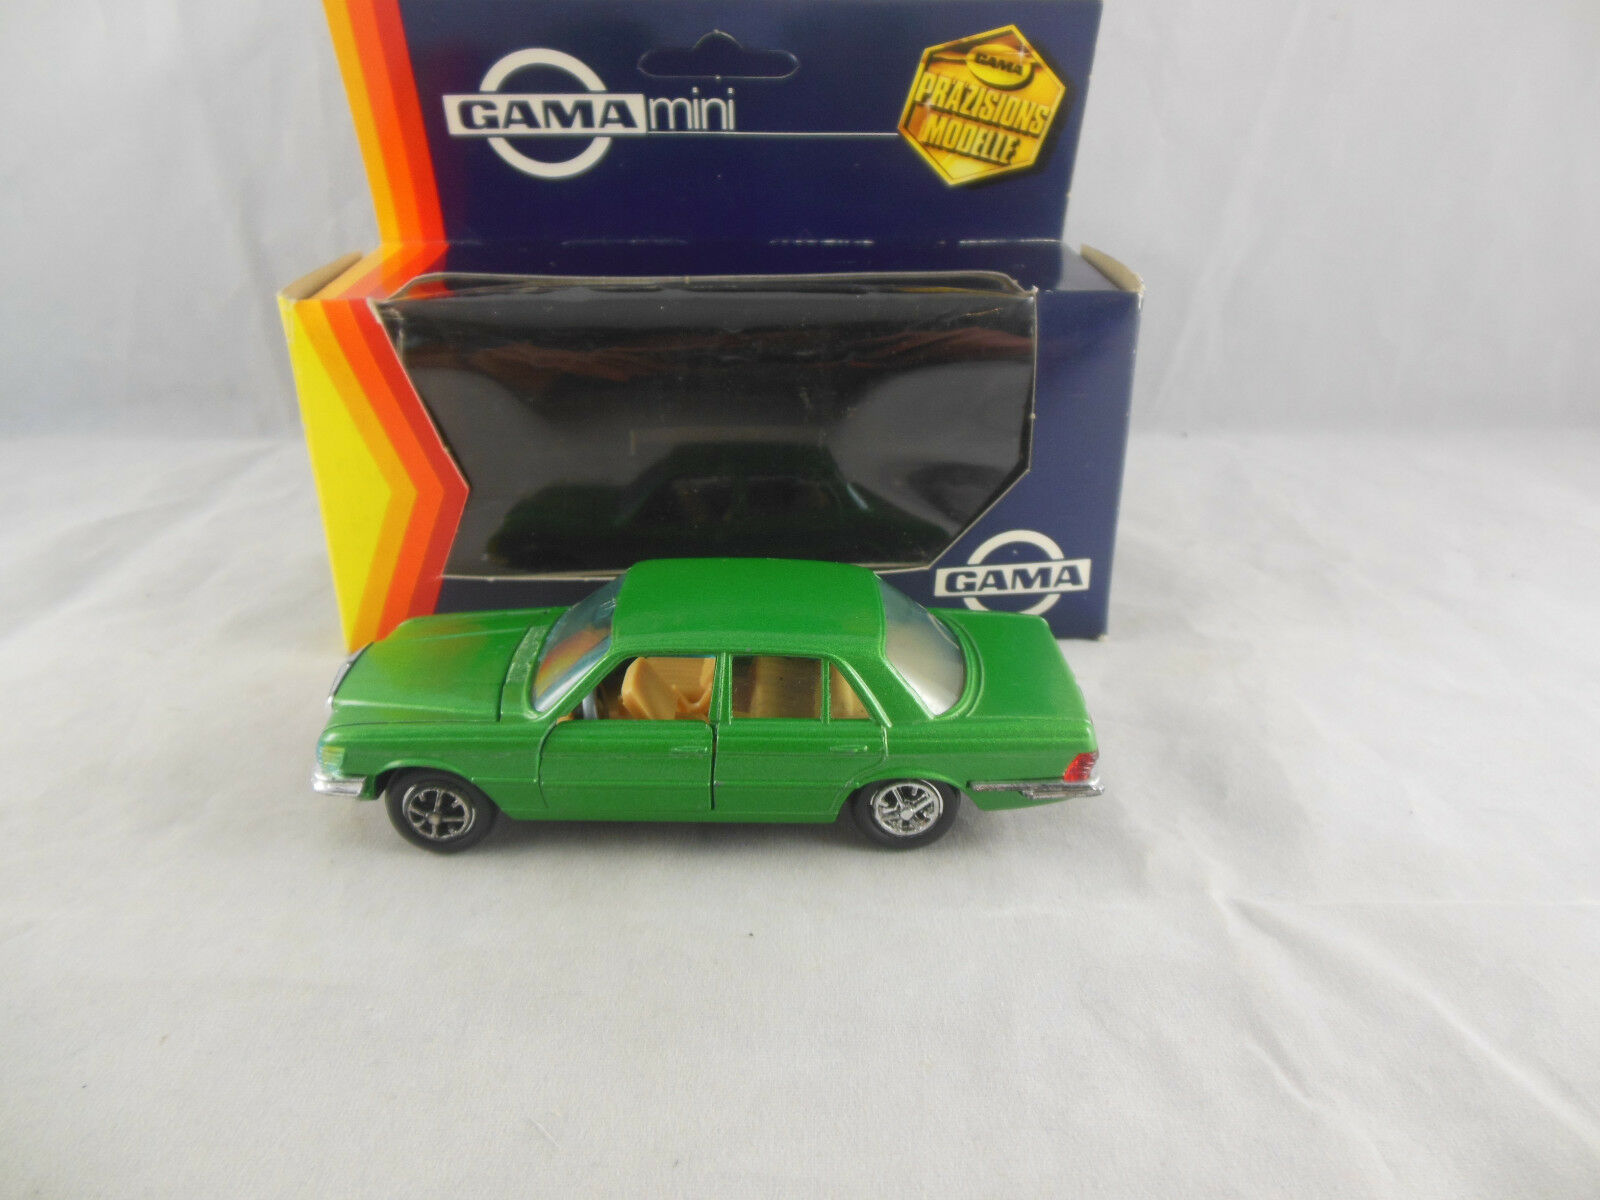 Gama Mini 1123 Mercedes Benz 450 SE Saloon in Metallic Green 1 43 Scale